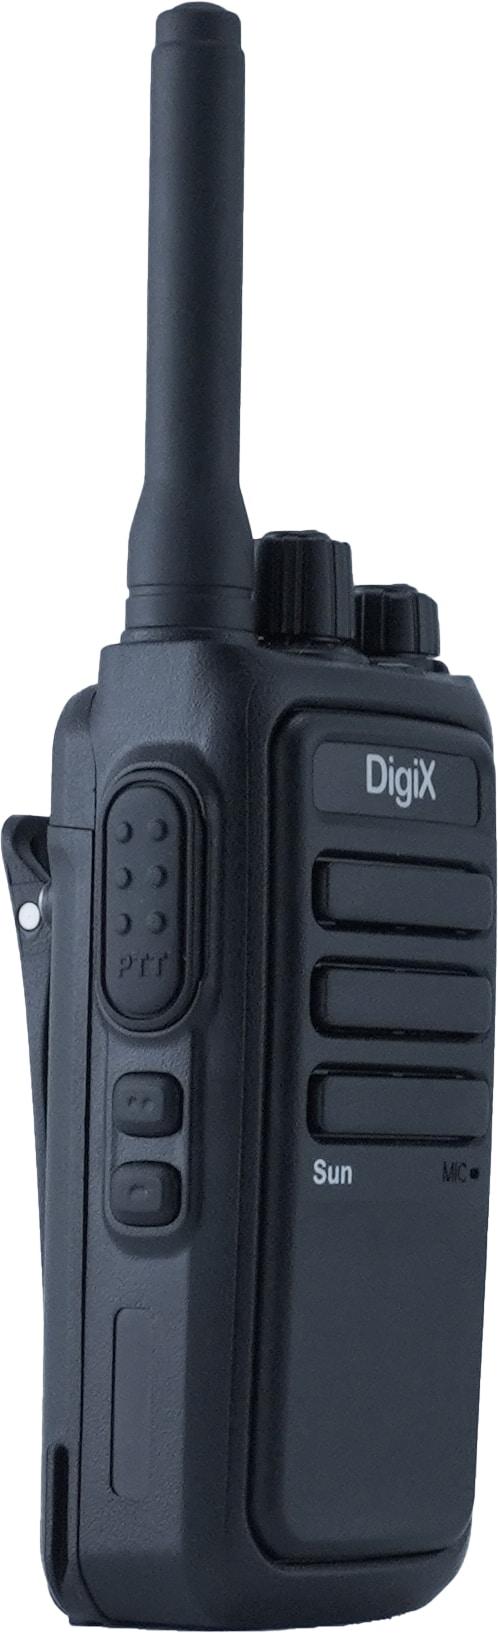 DigiX Sun Black